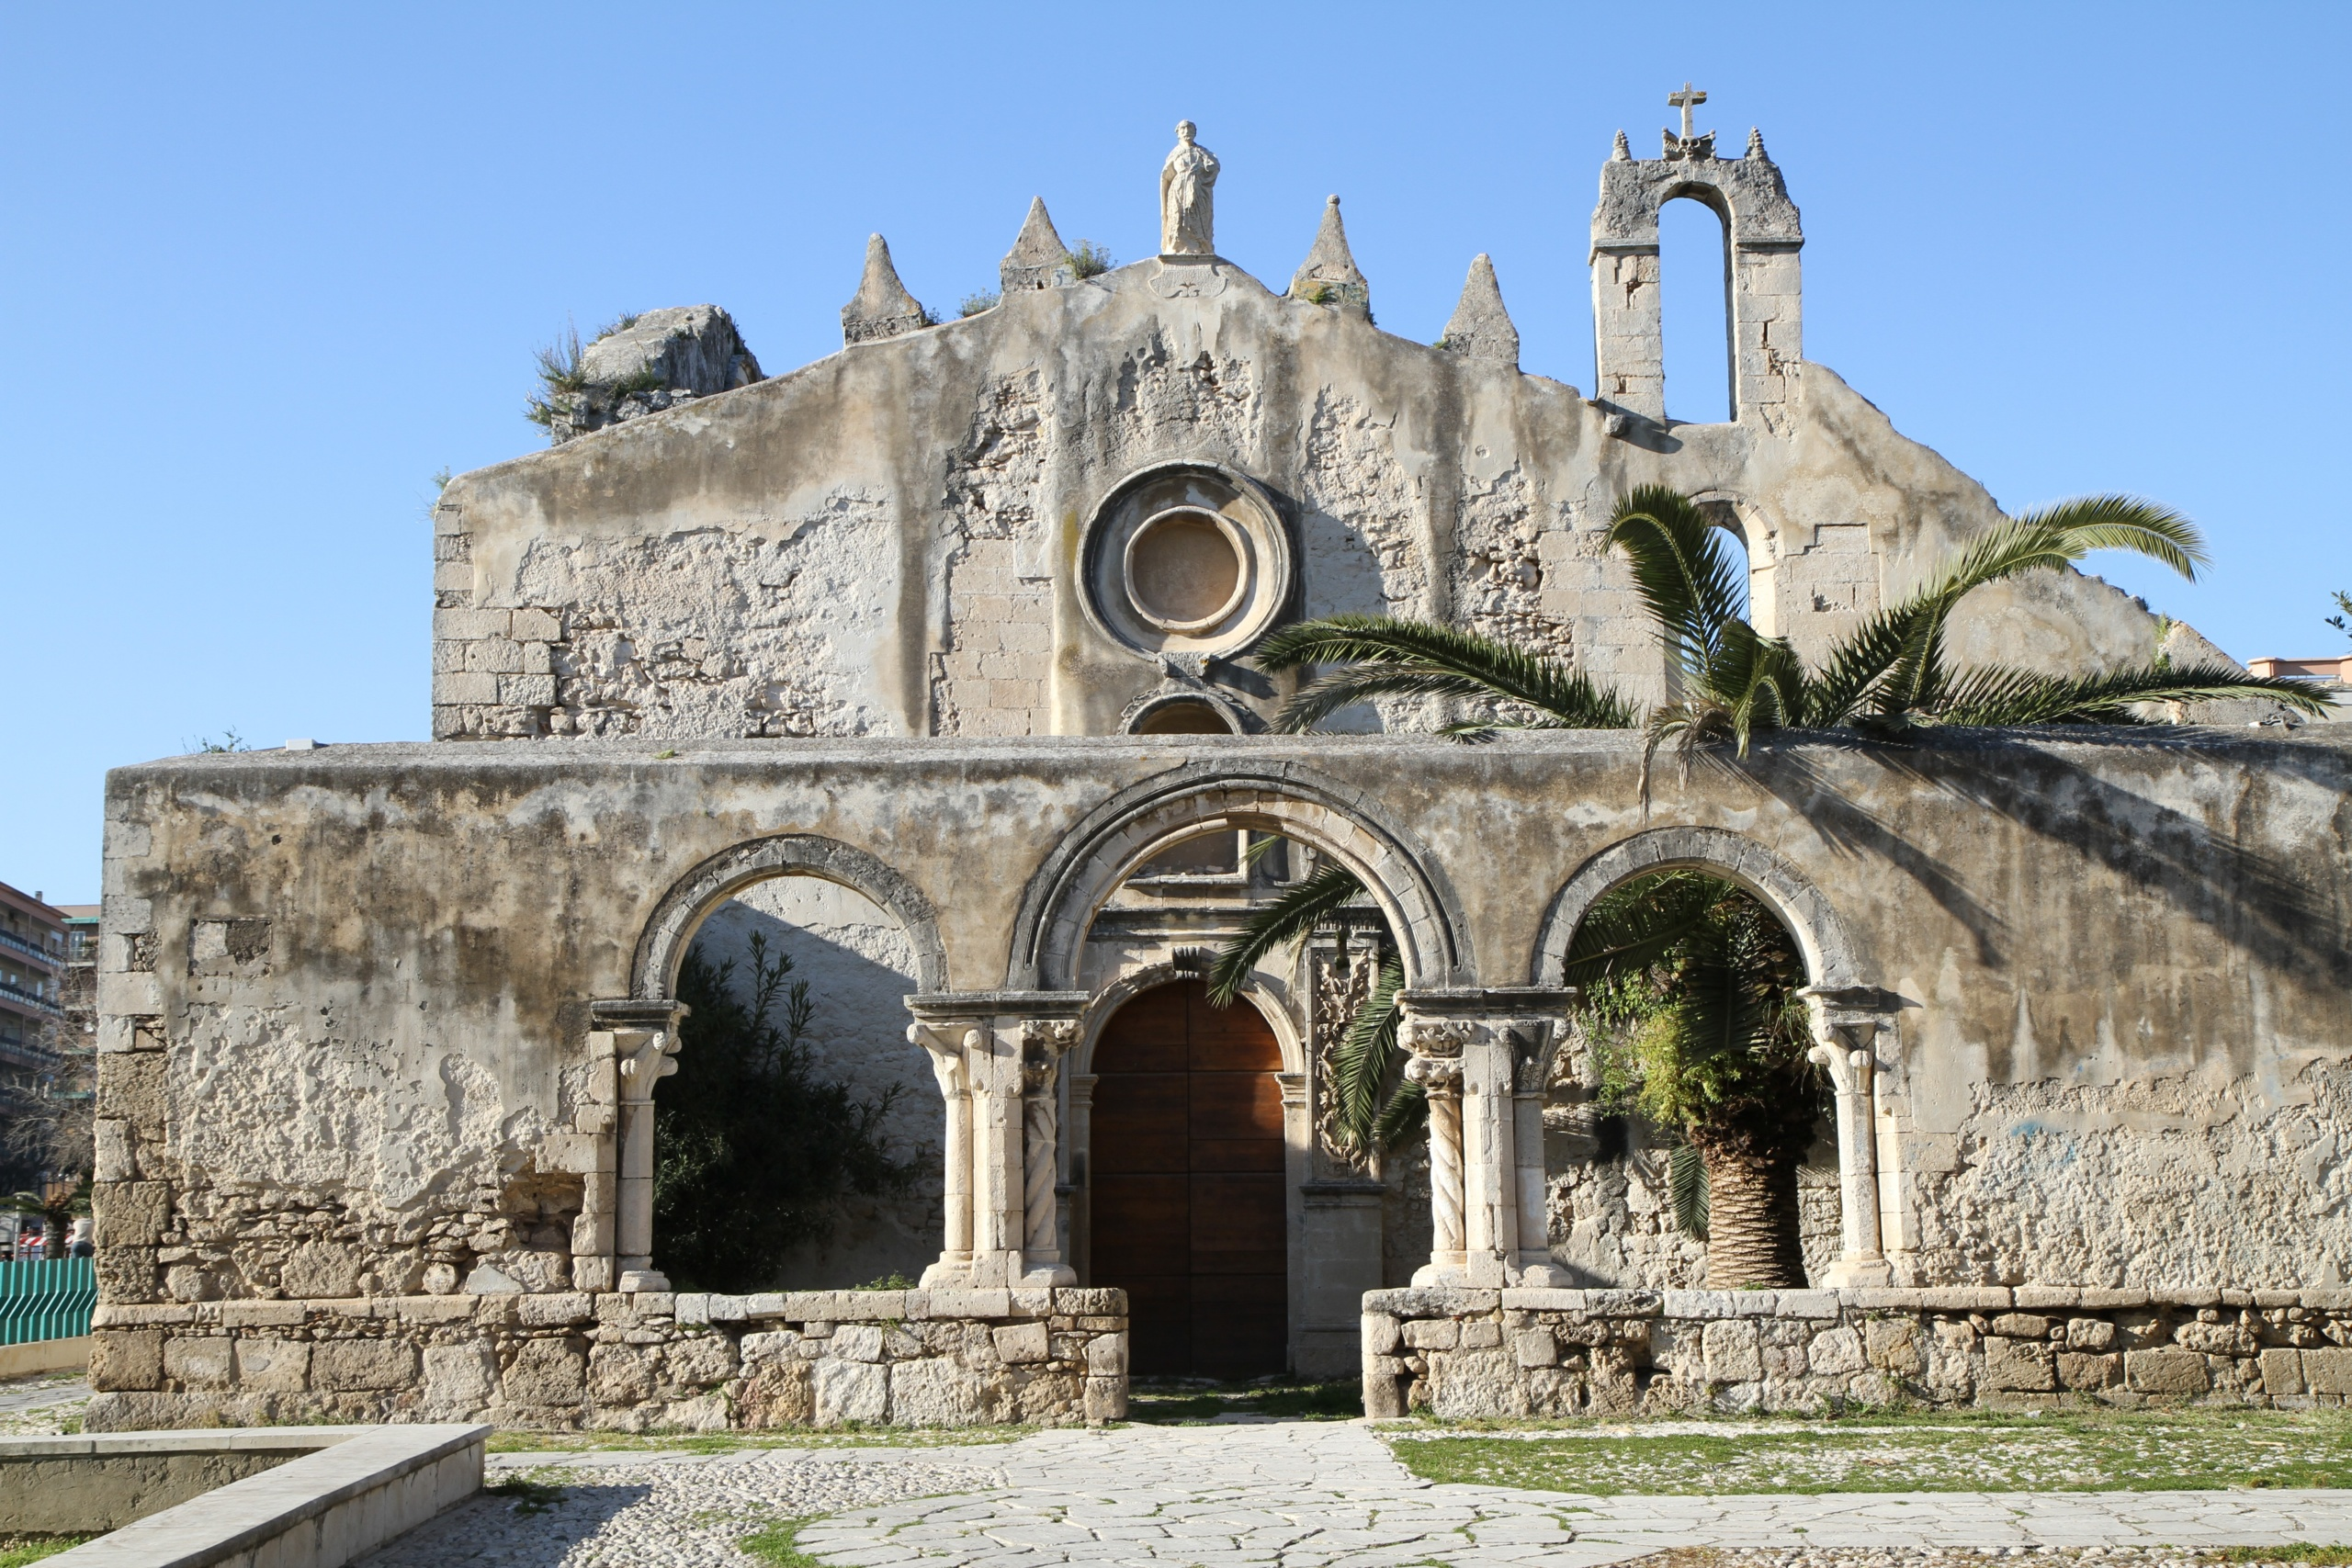 Catacombe di Siracusa